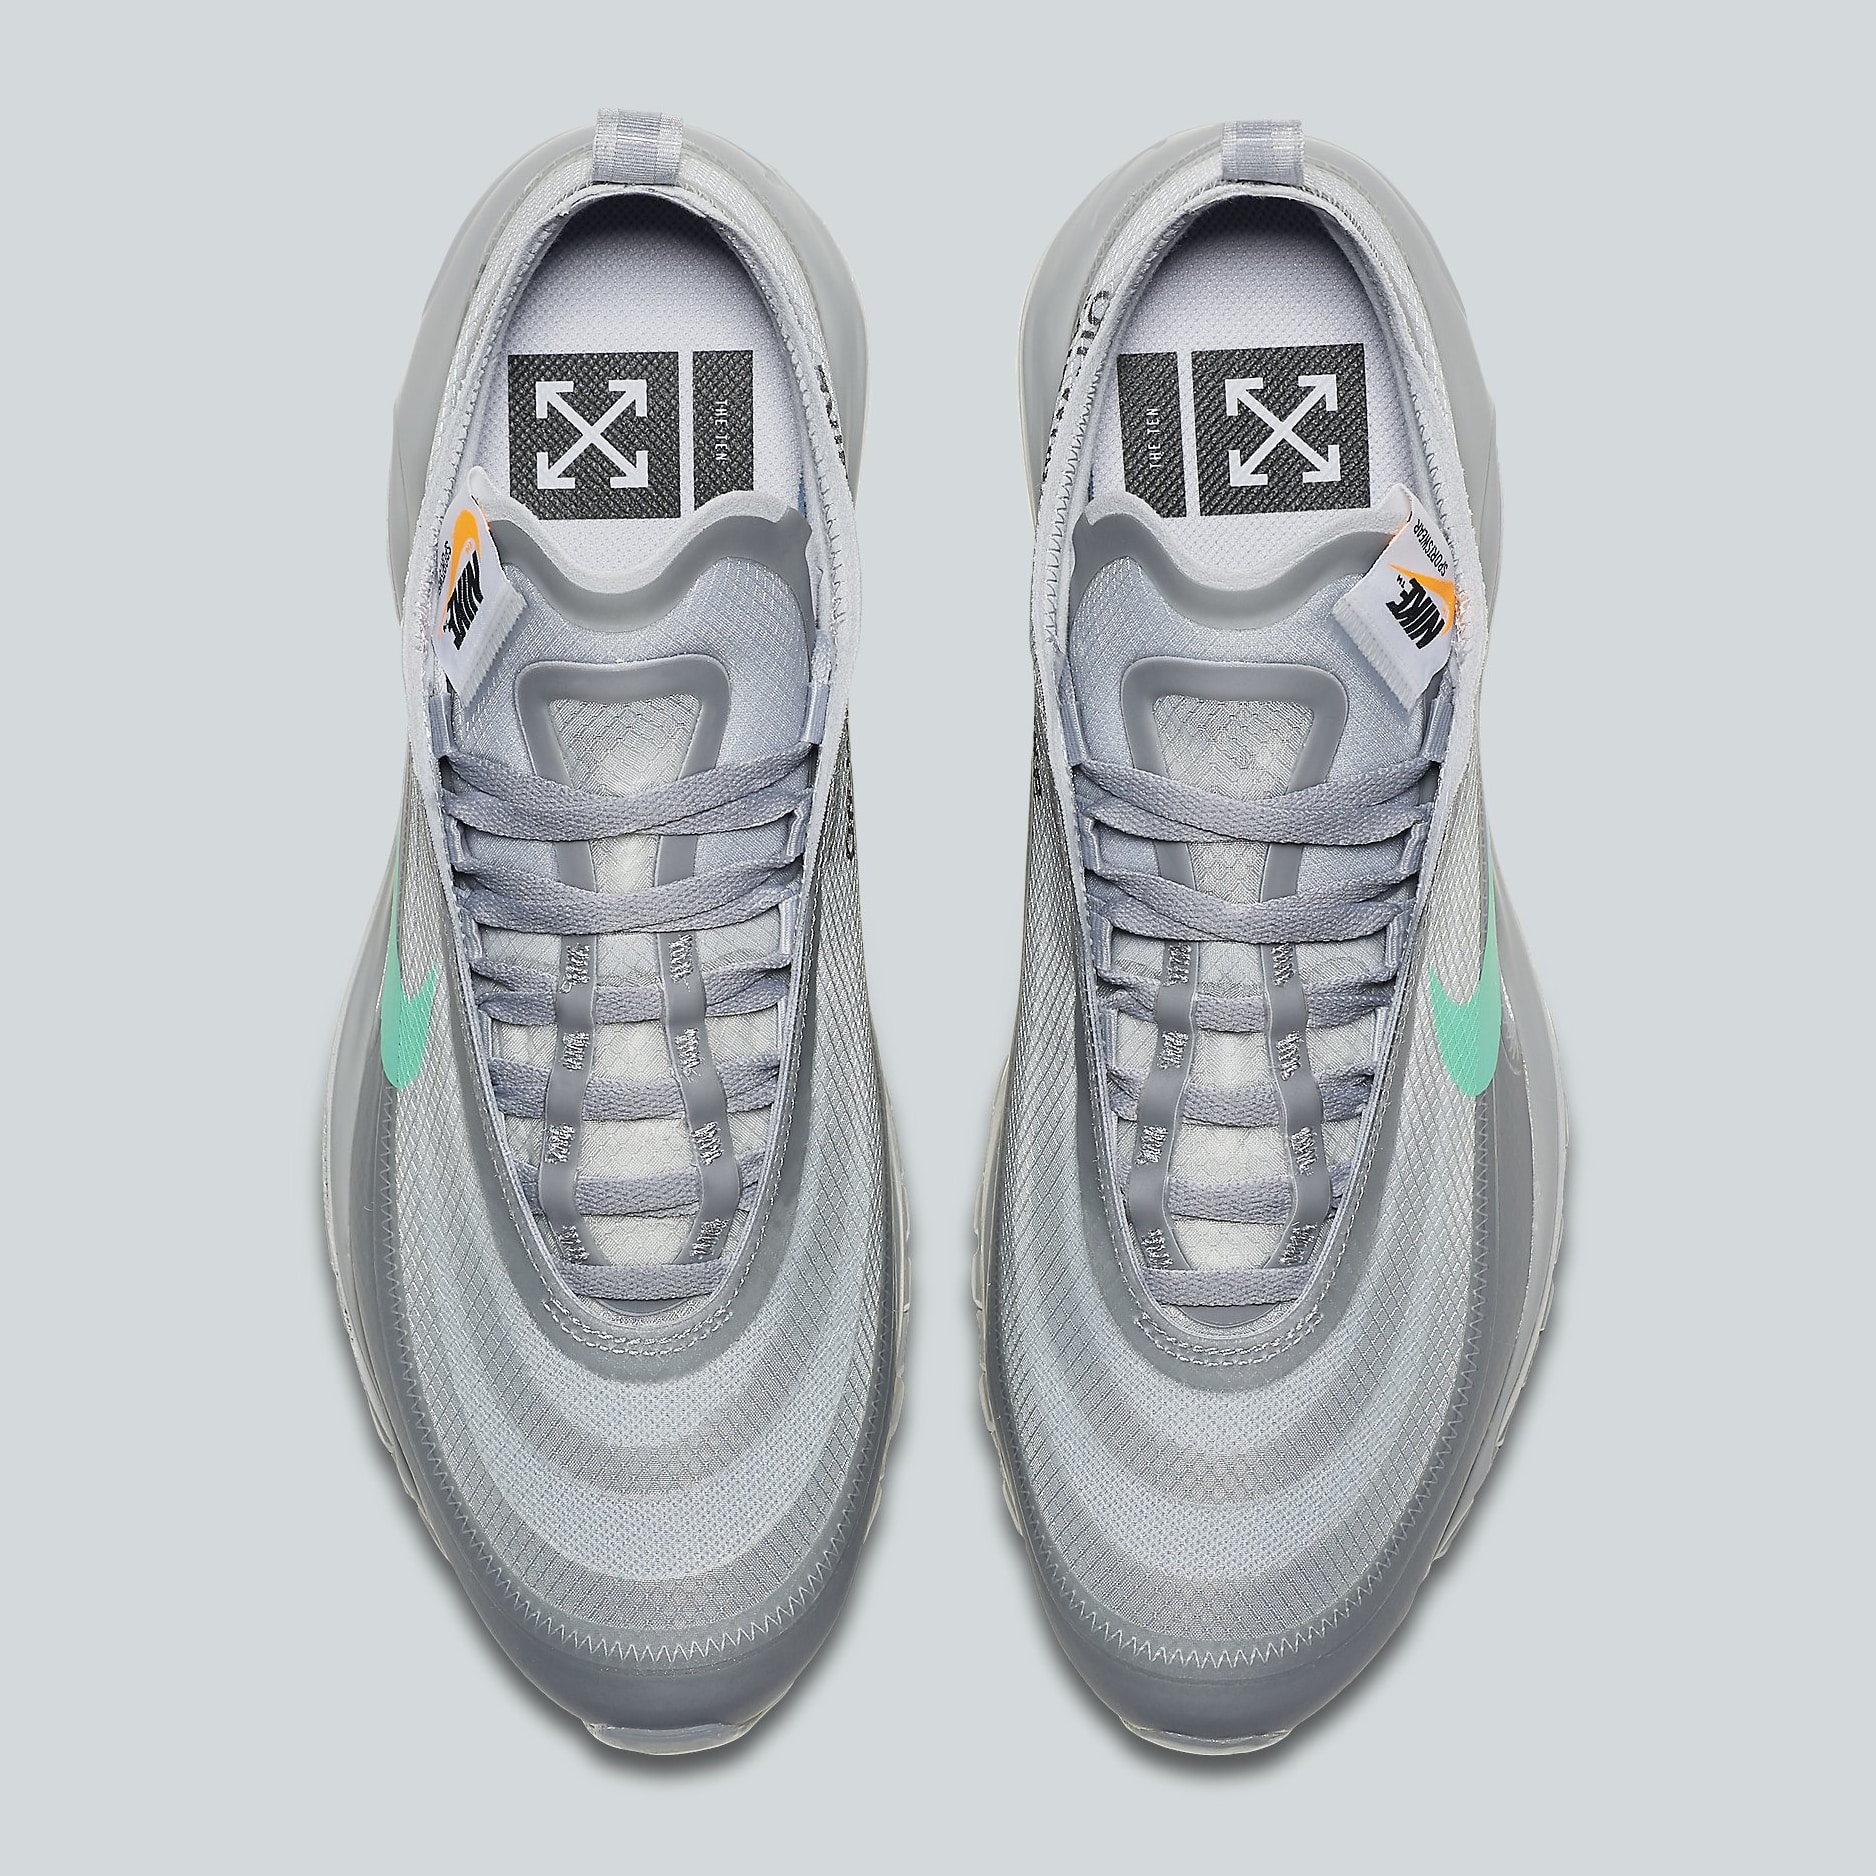 Off White X Nike Air Max 97 Menta Solegrind